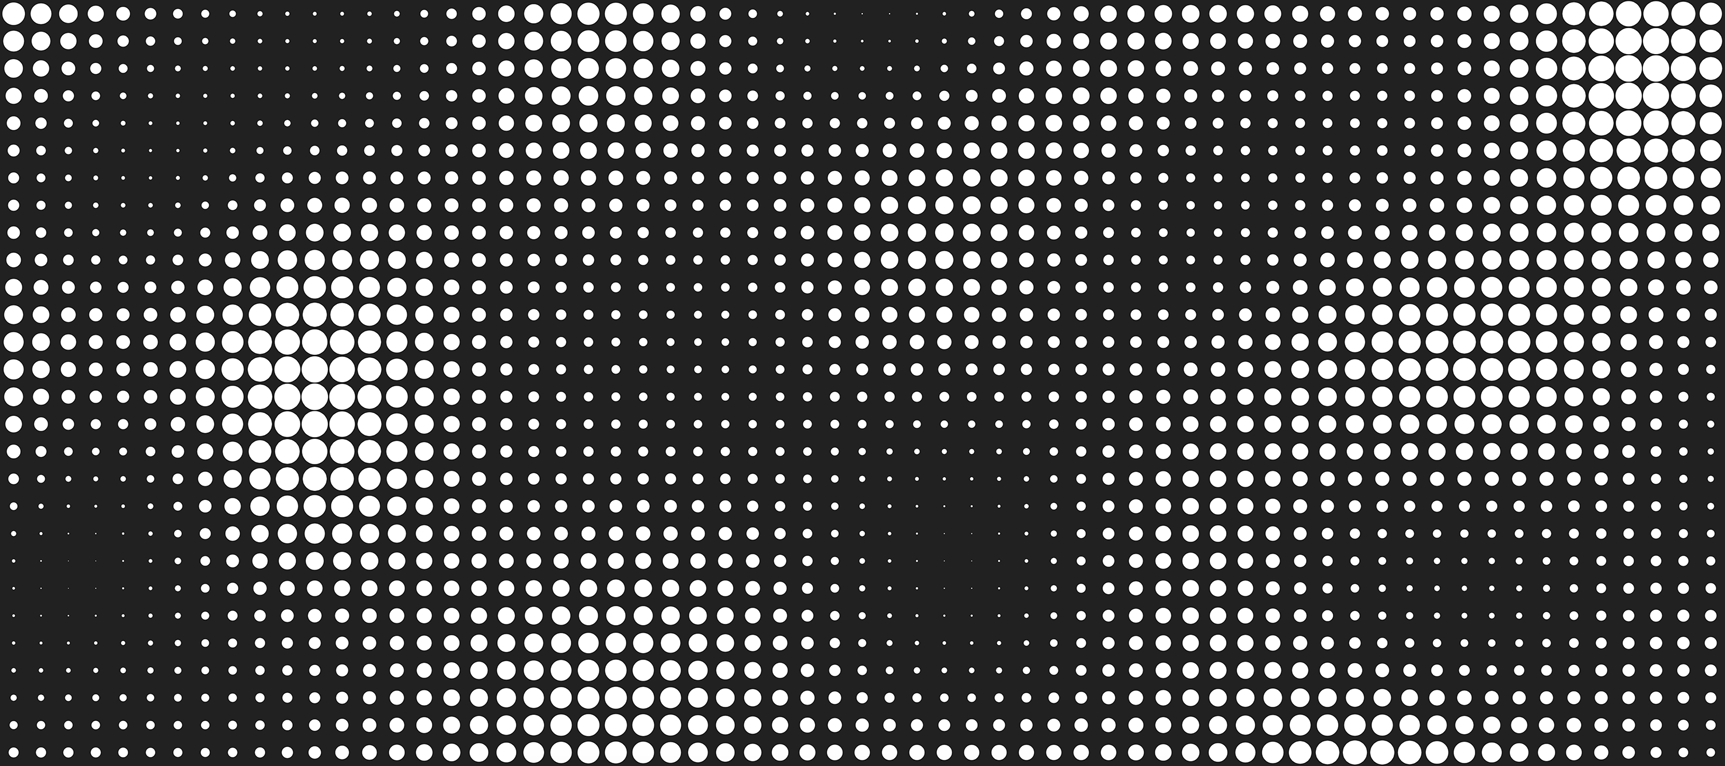 halftone noise pattern